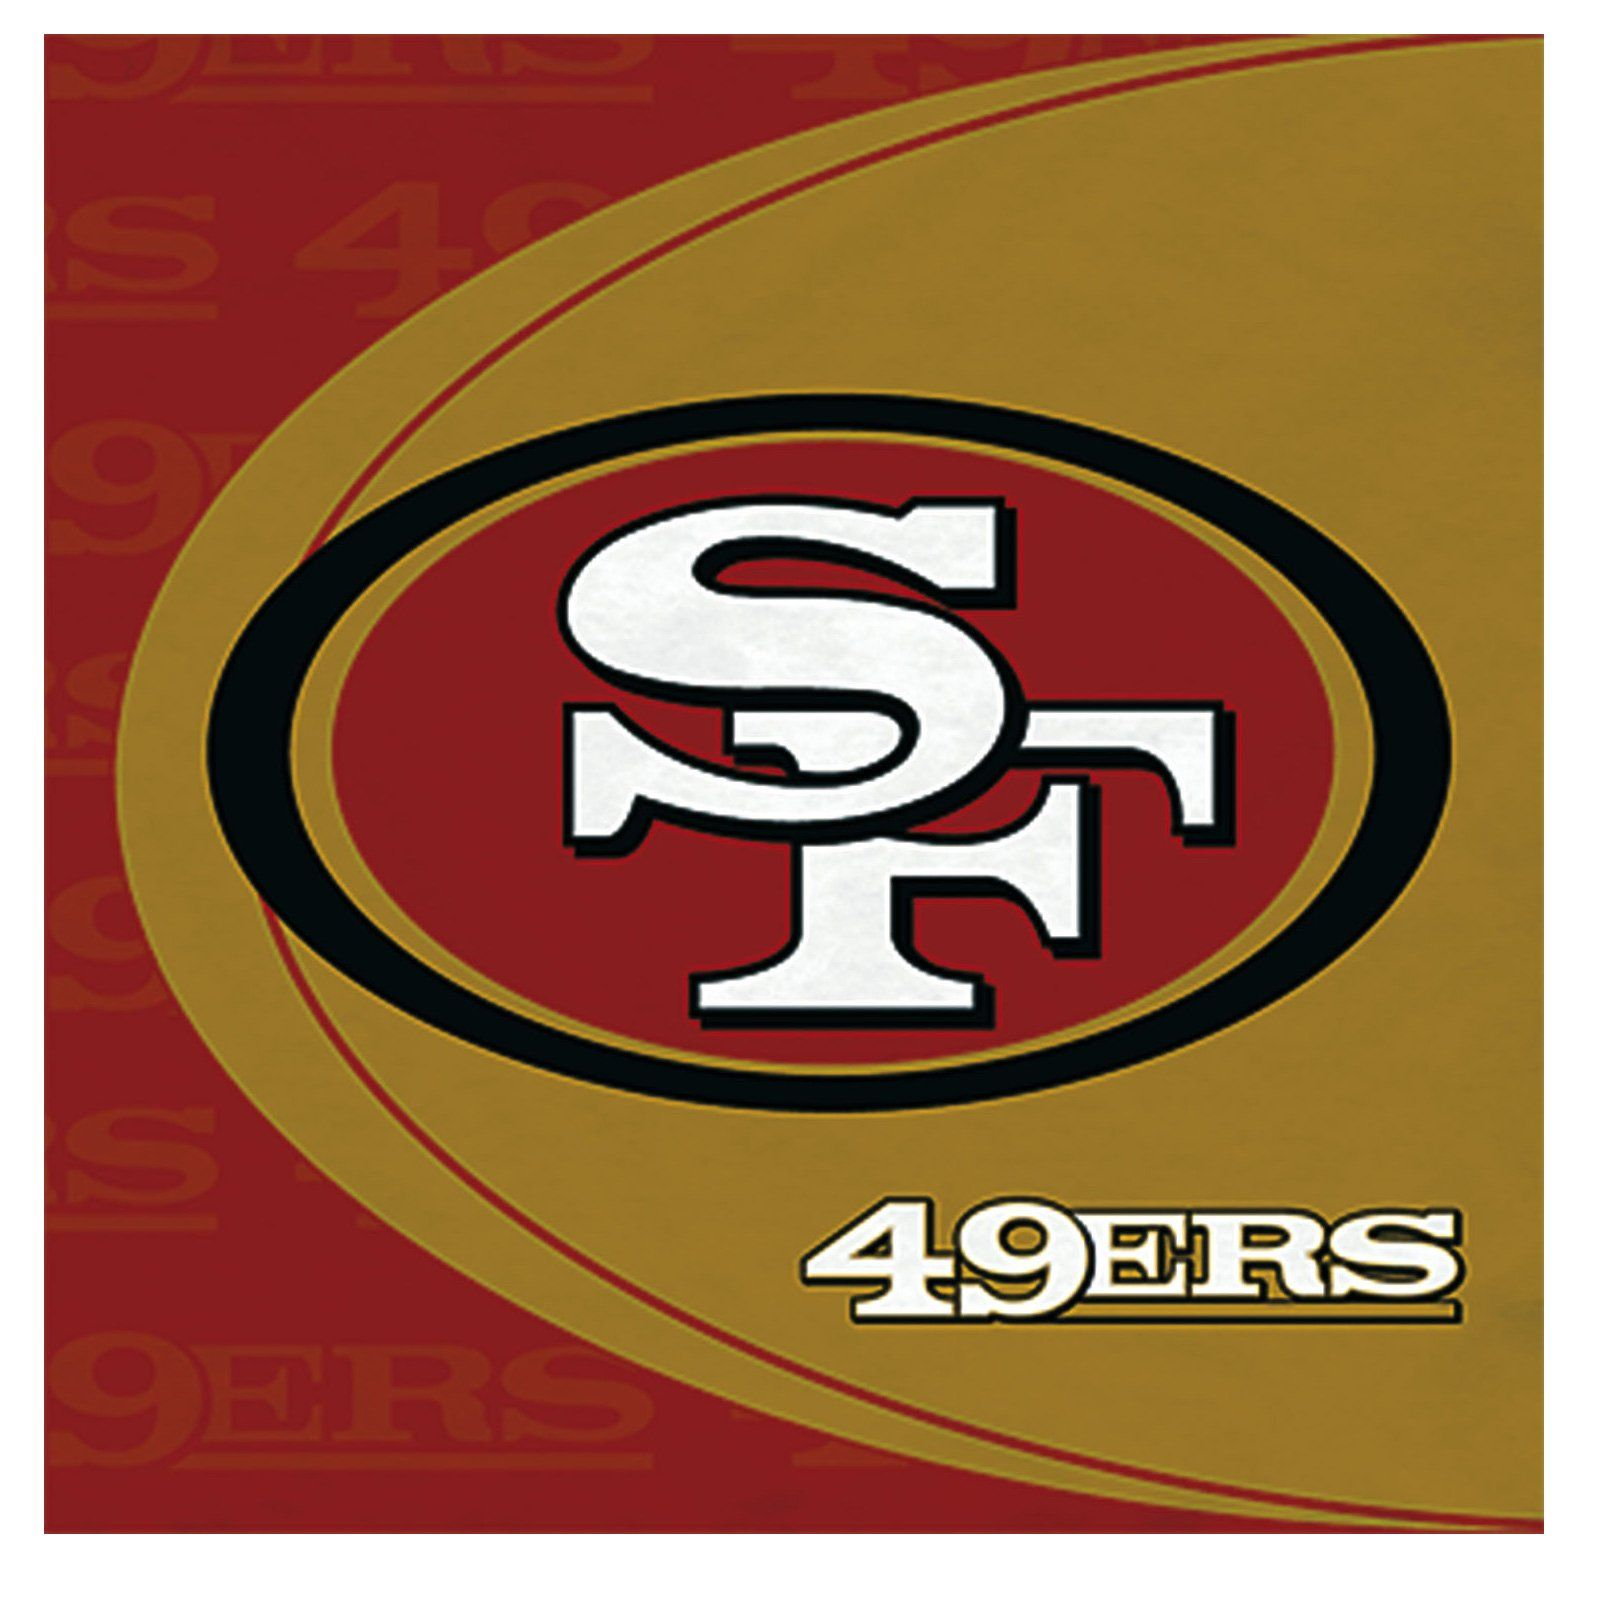 Go niners san francisco 49ers nfl nfl teams logos san